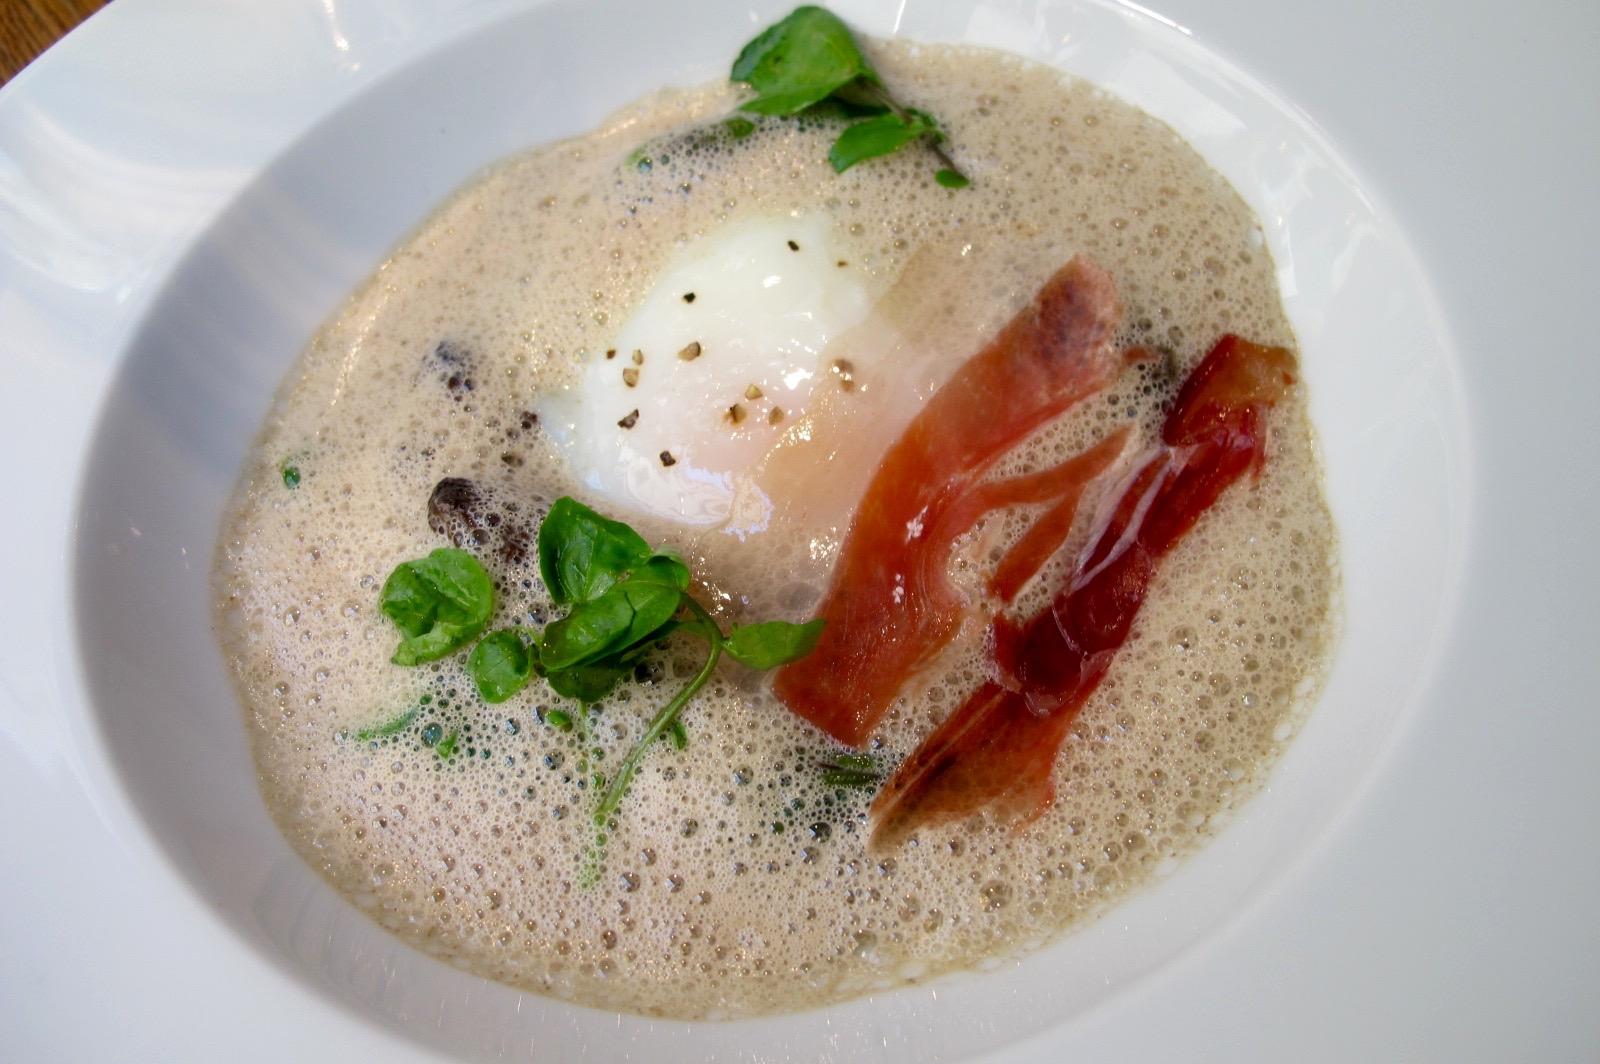 Poached egg at Spring restaurant in Paris